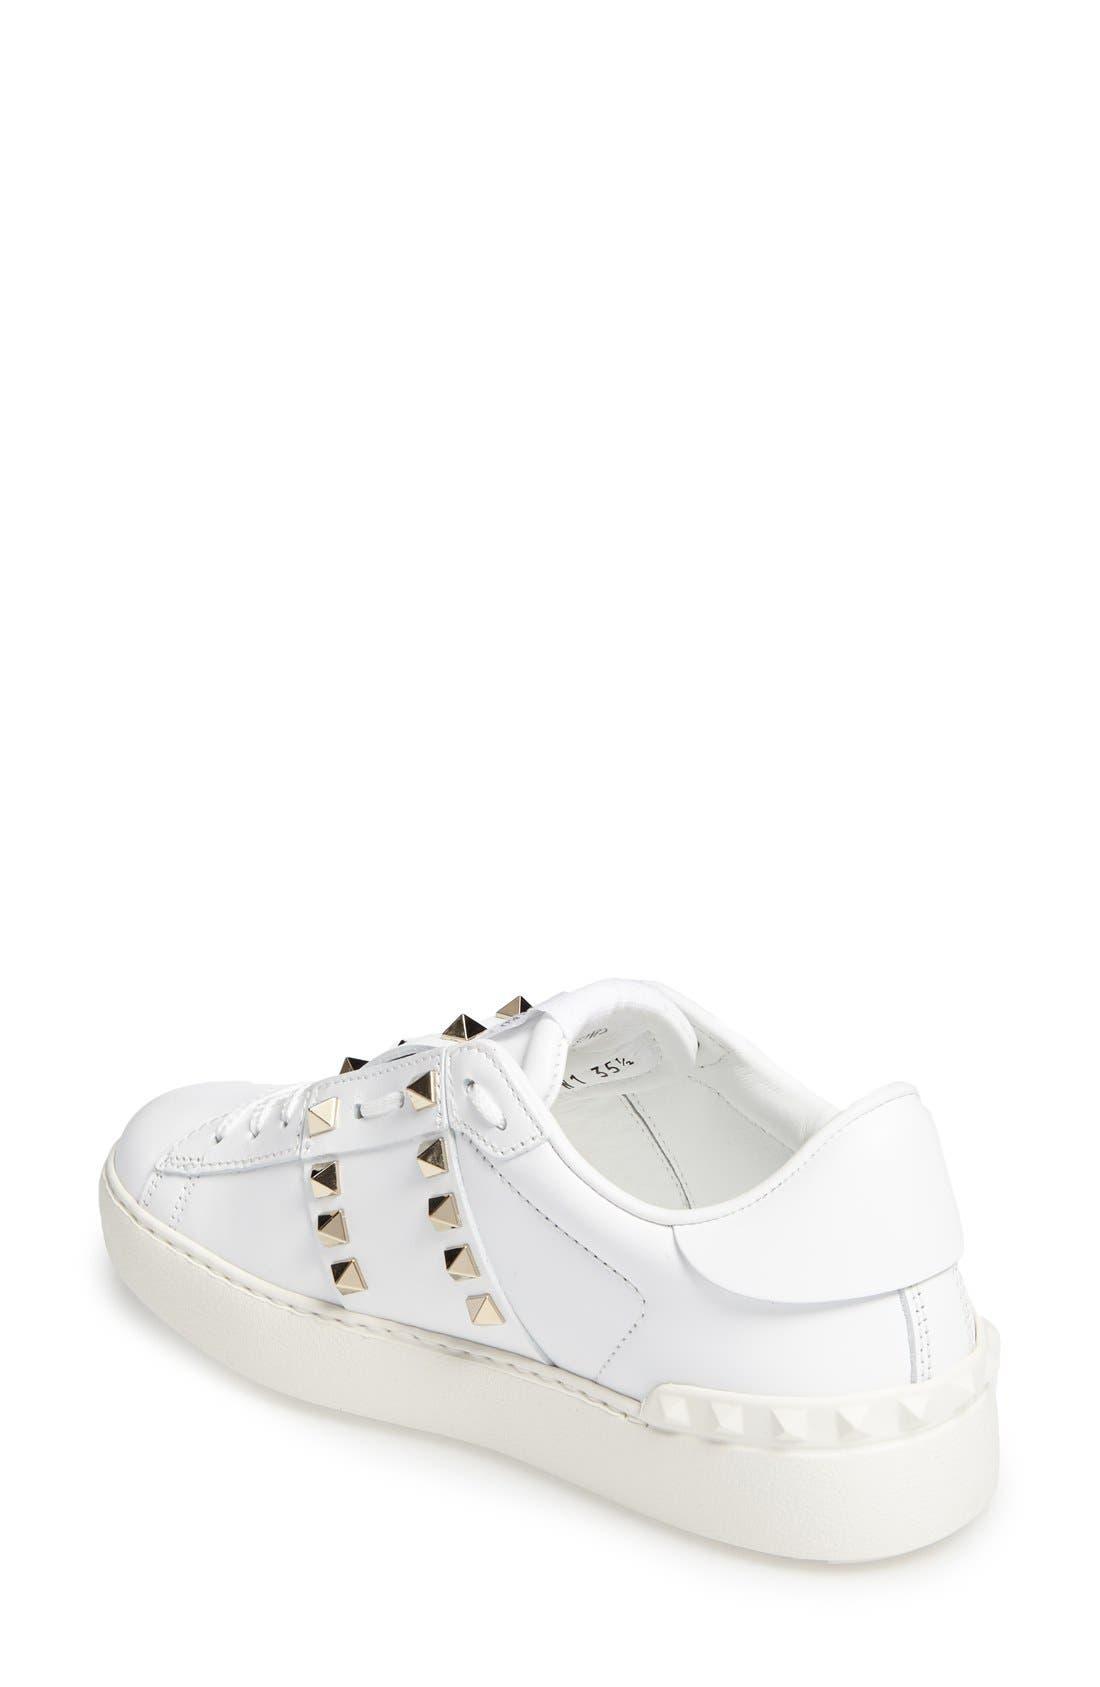 'Rockstud' Sneaker,                             Alternate thumbnail 5, color,                             WHITE LEATHER